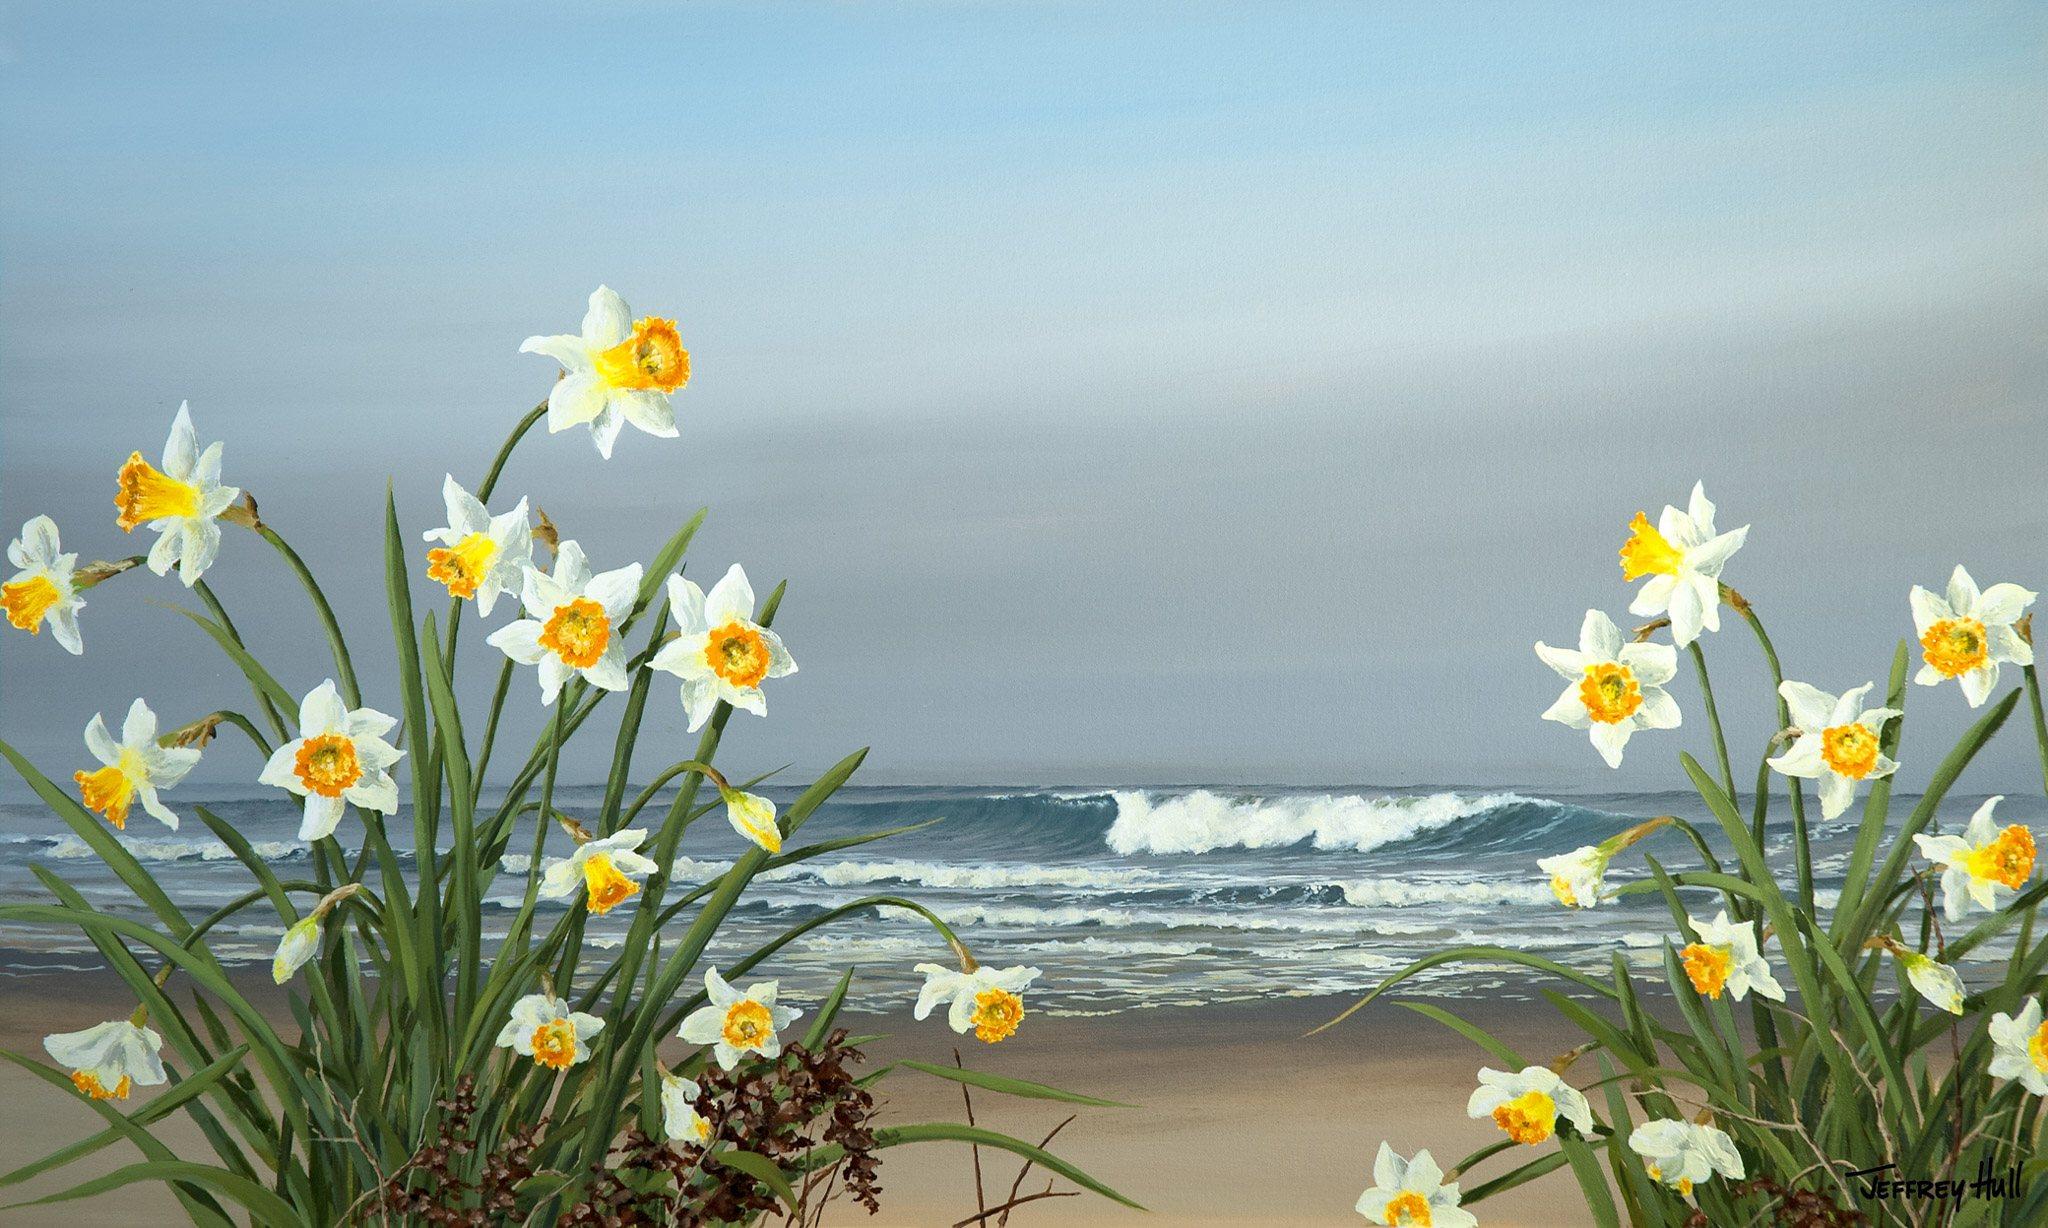 Shoreline-Daffodils-4-Home-Page